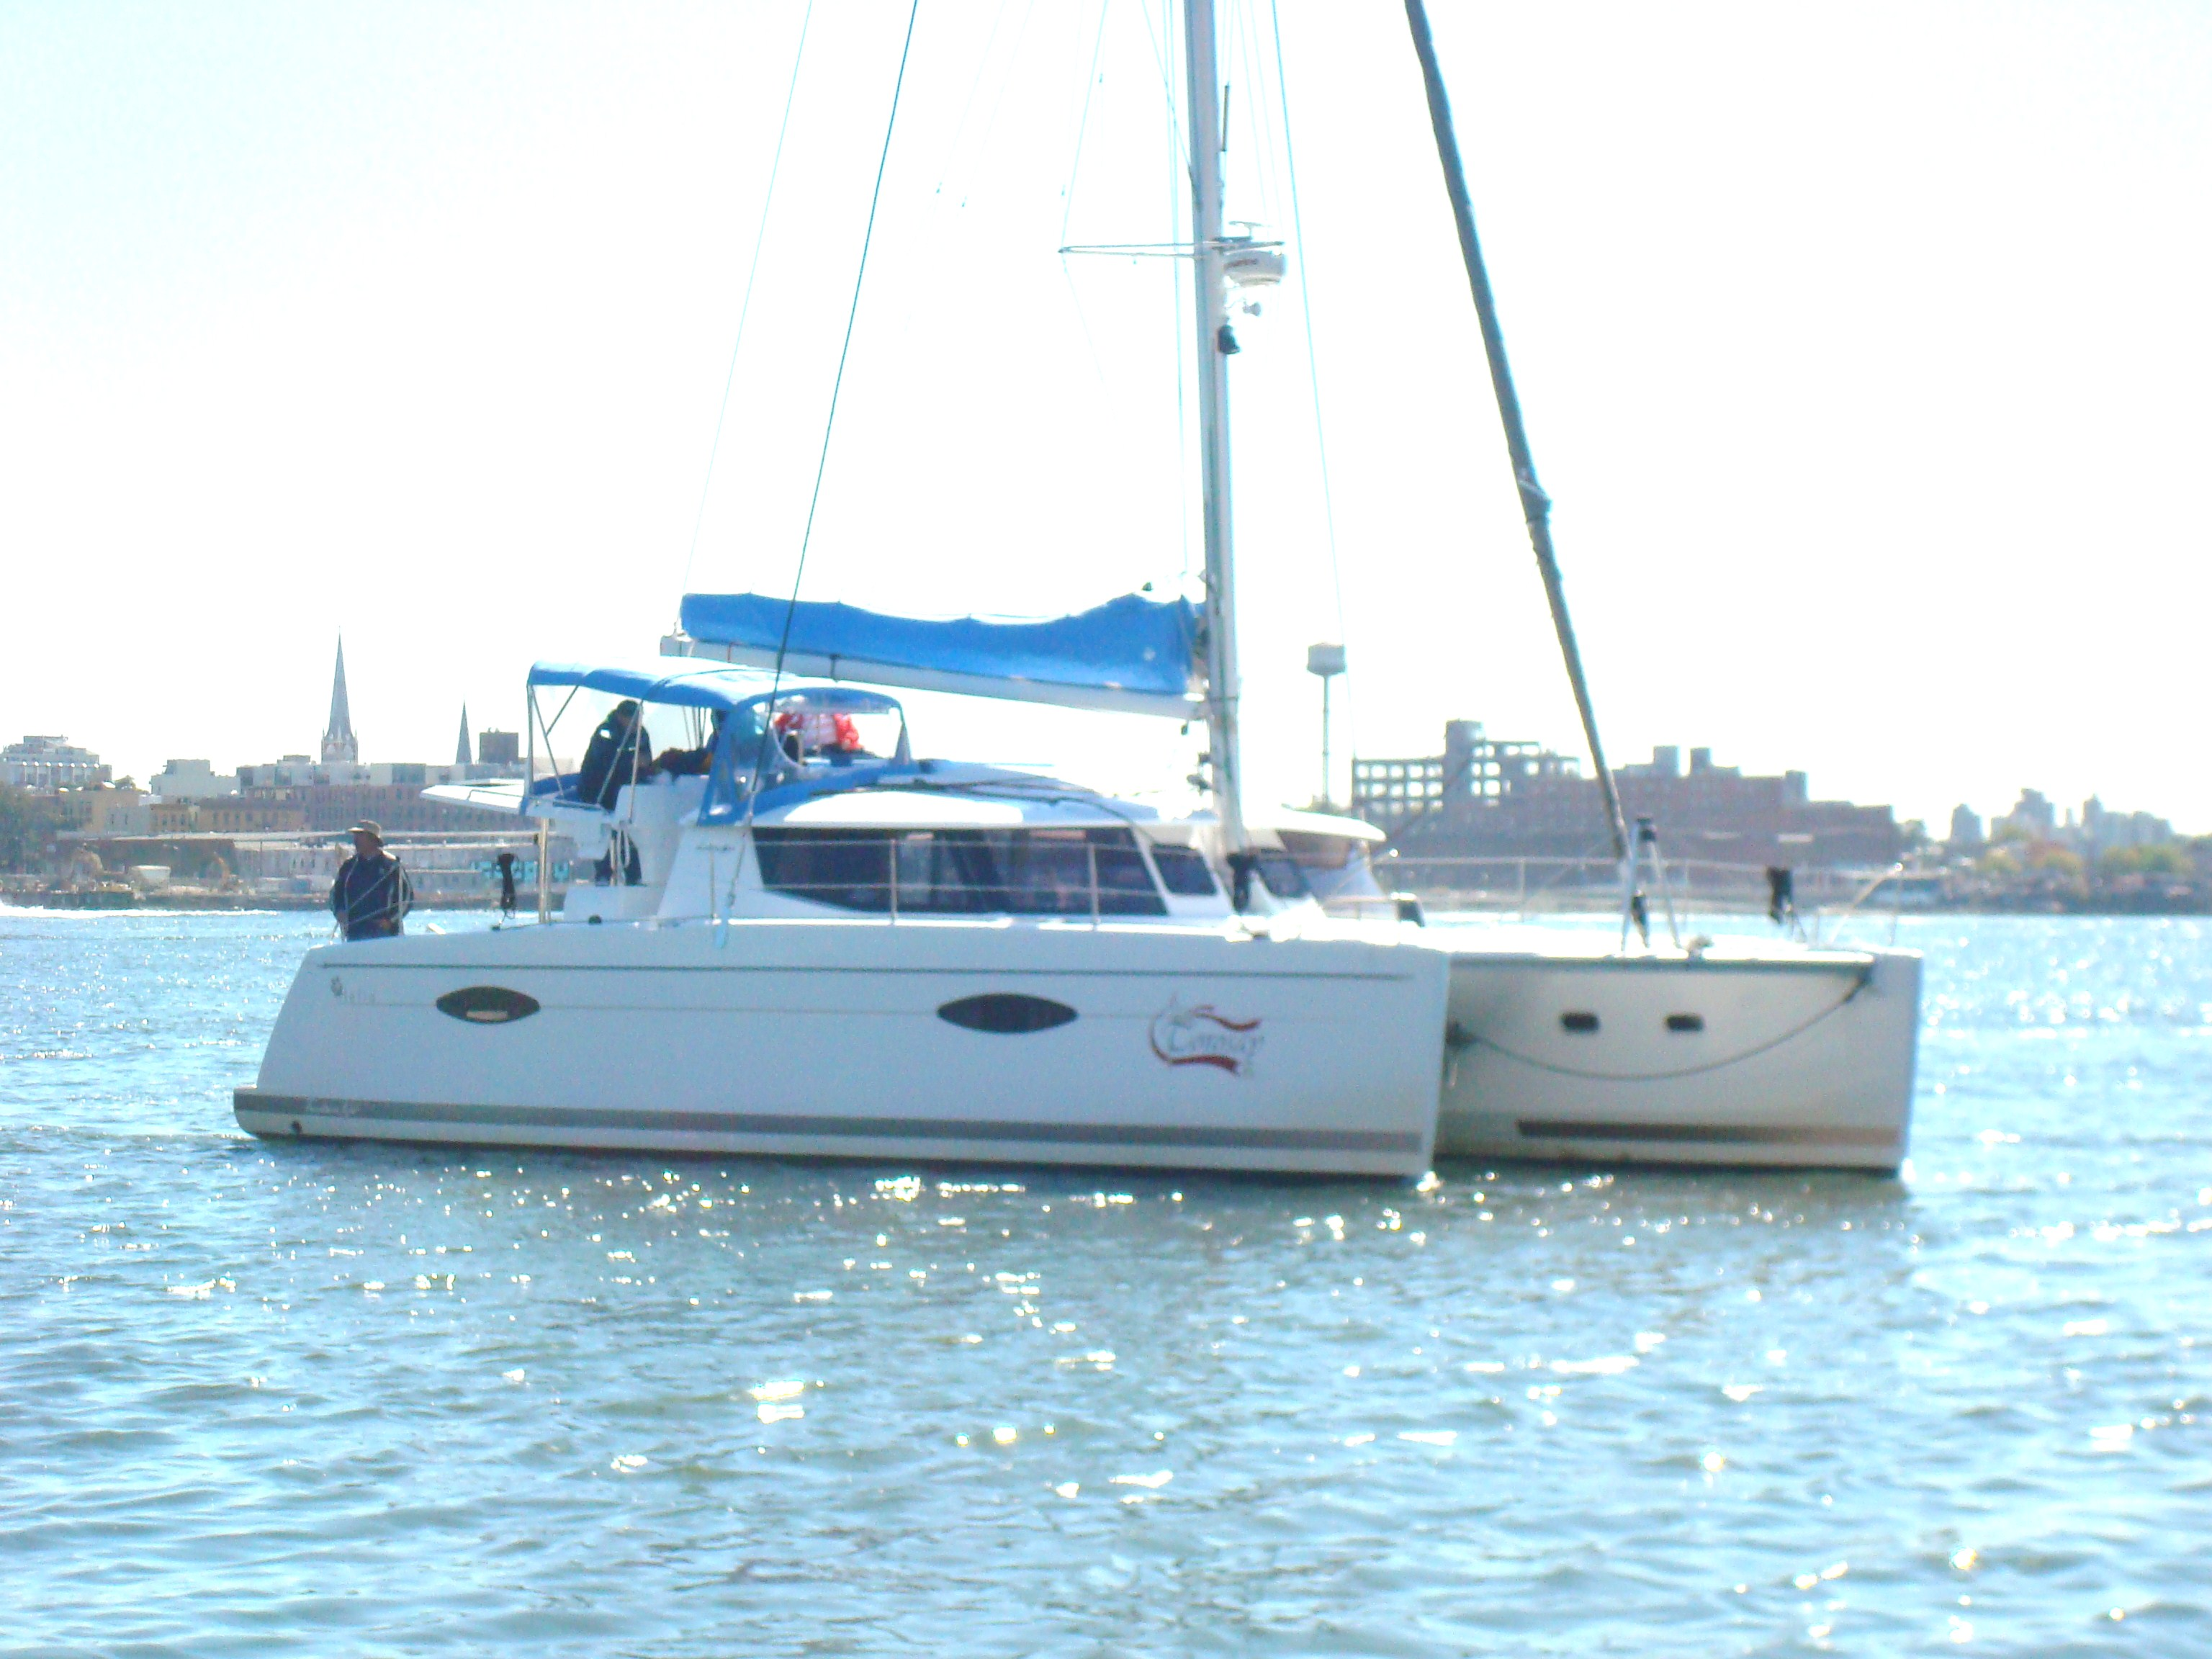 Narragansett Sailing Charters